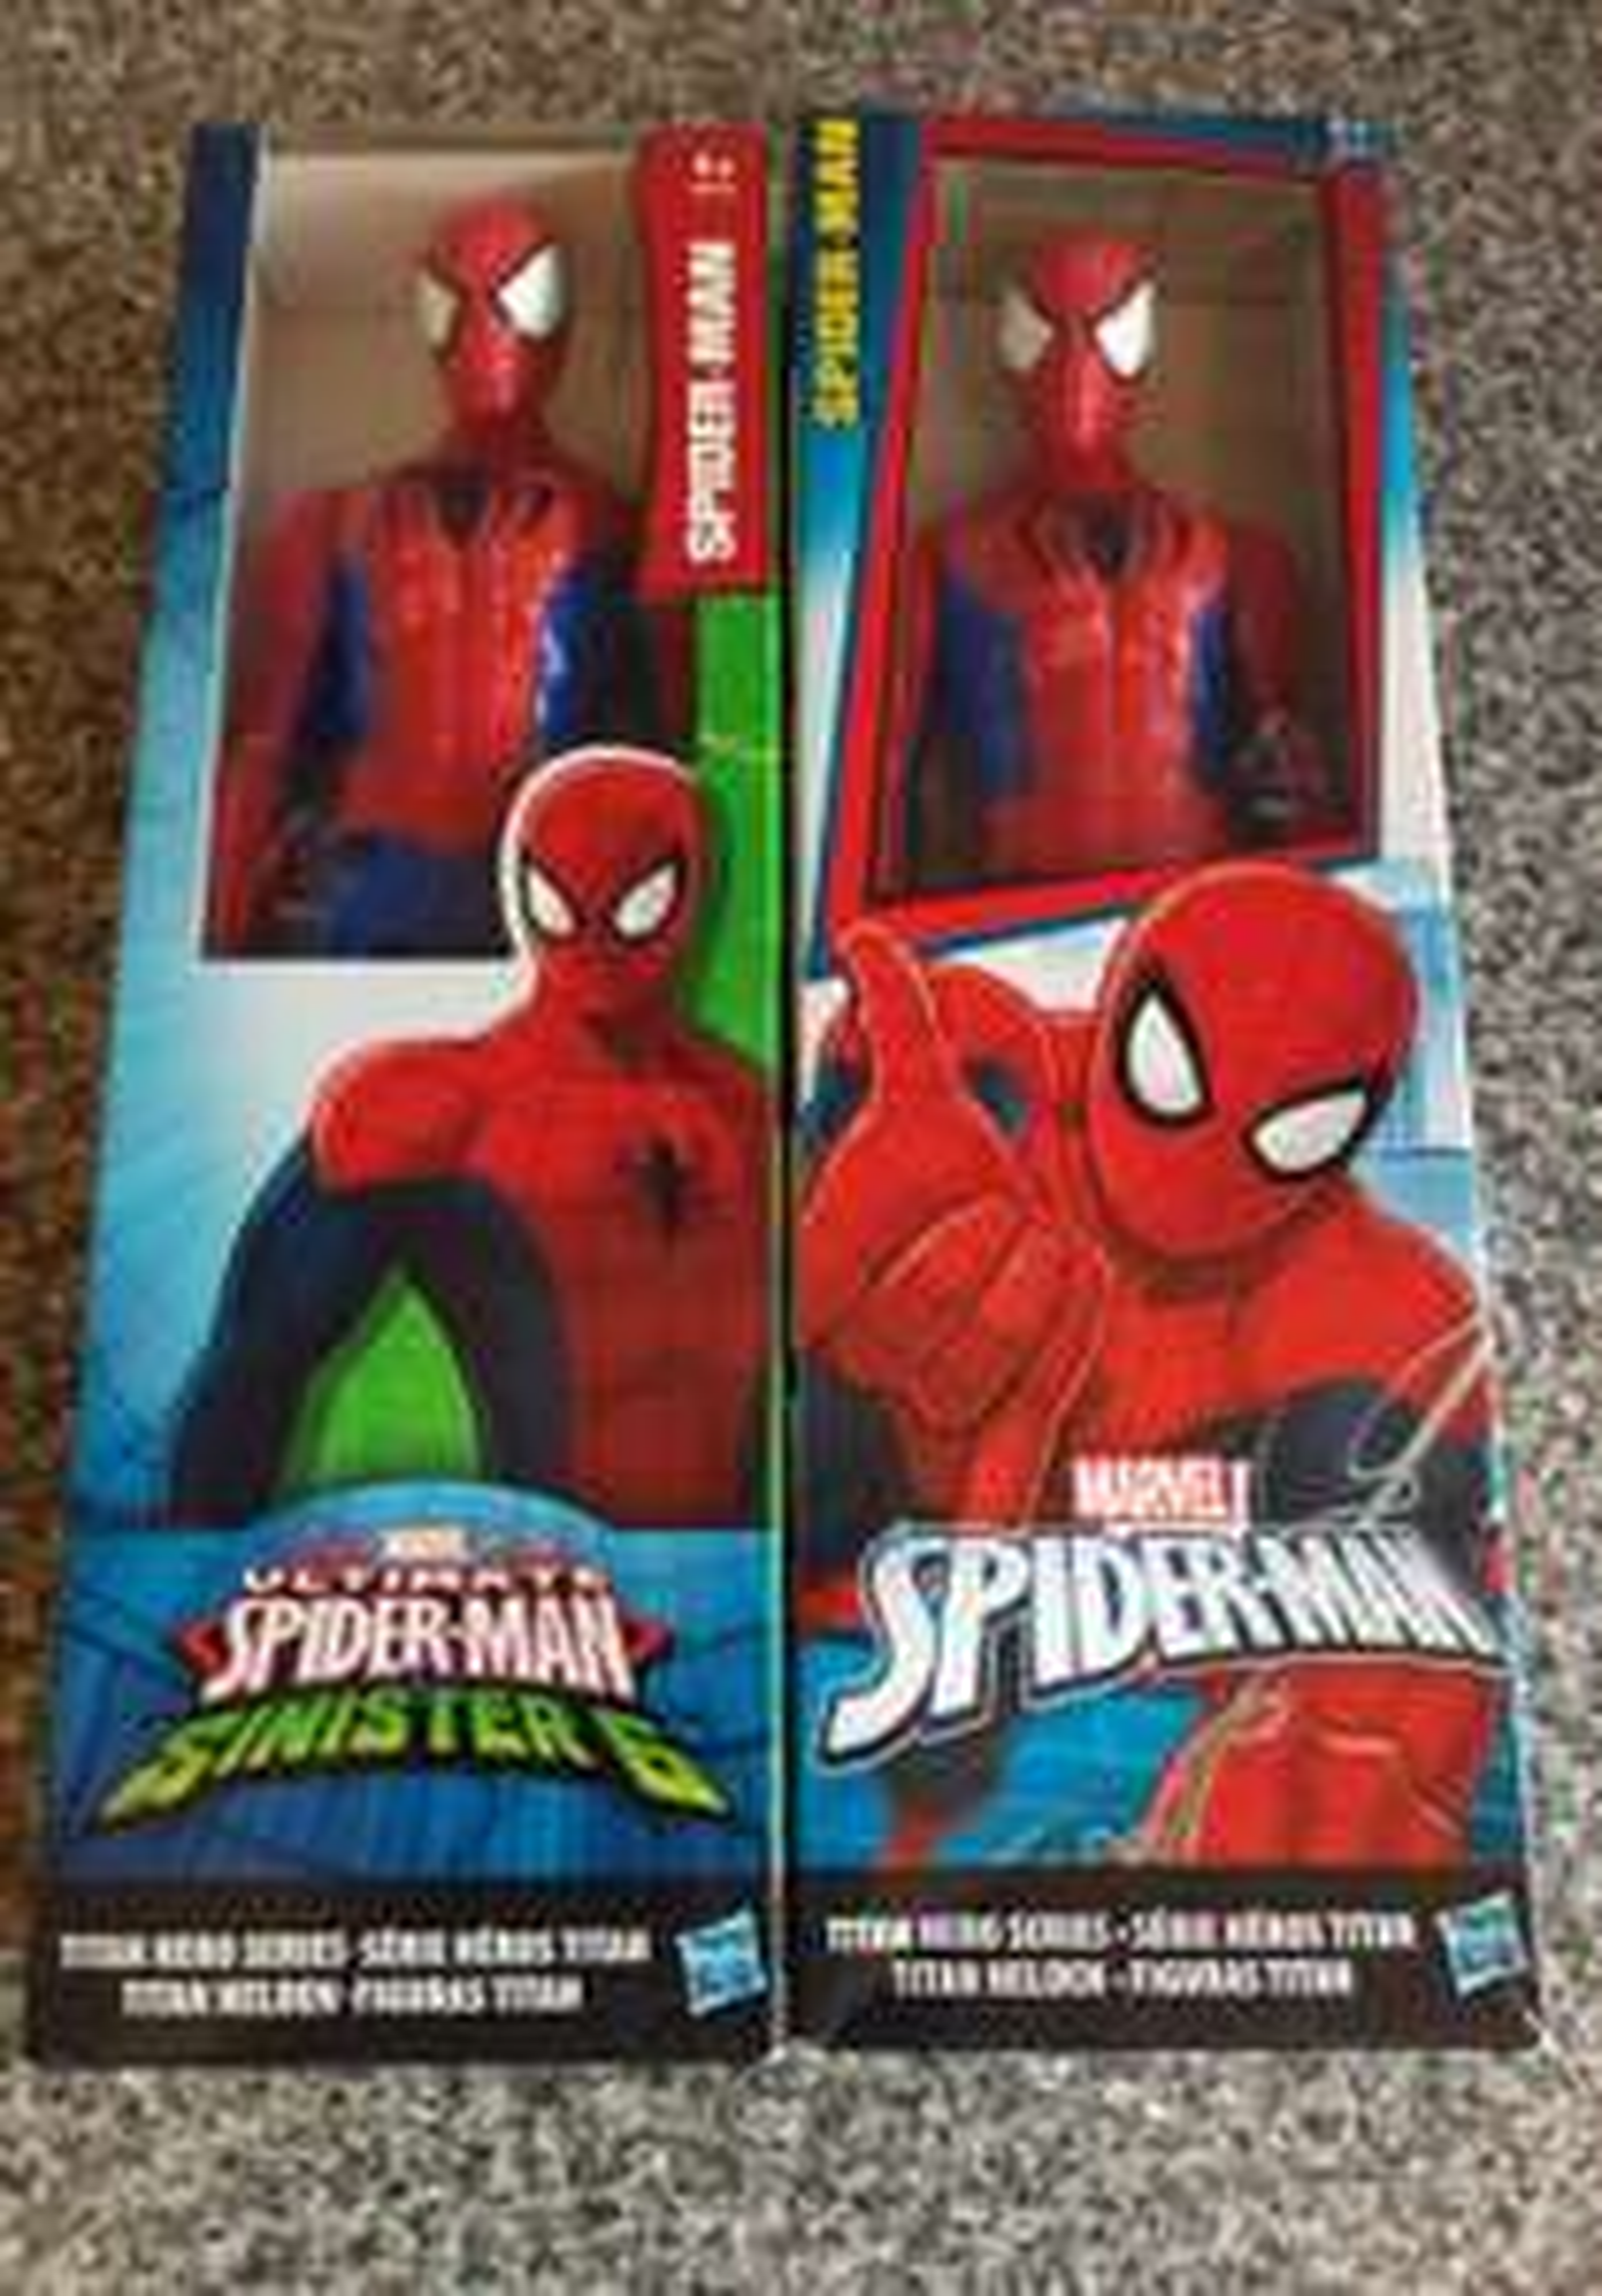 Spiderman Titan figure - £1.30 instore @ Sainsbury's (Sunderland)